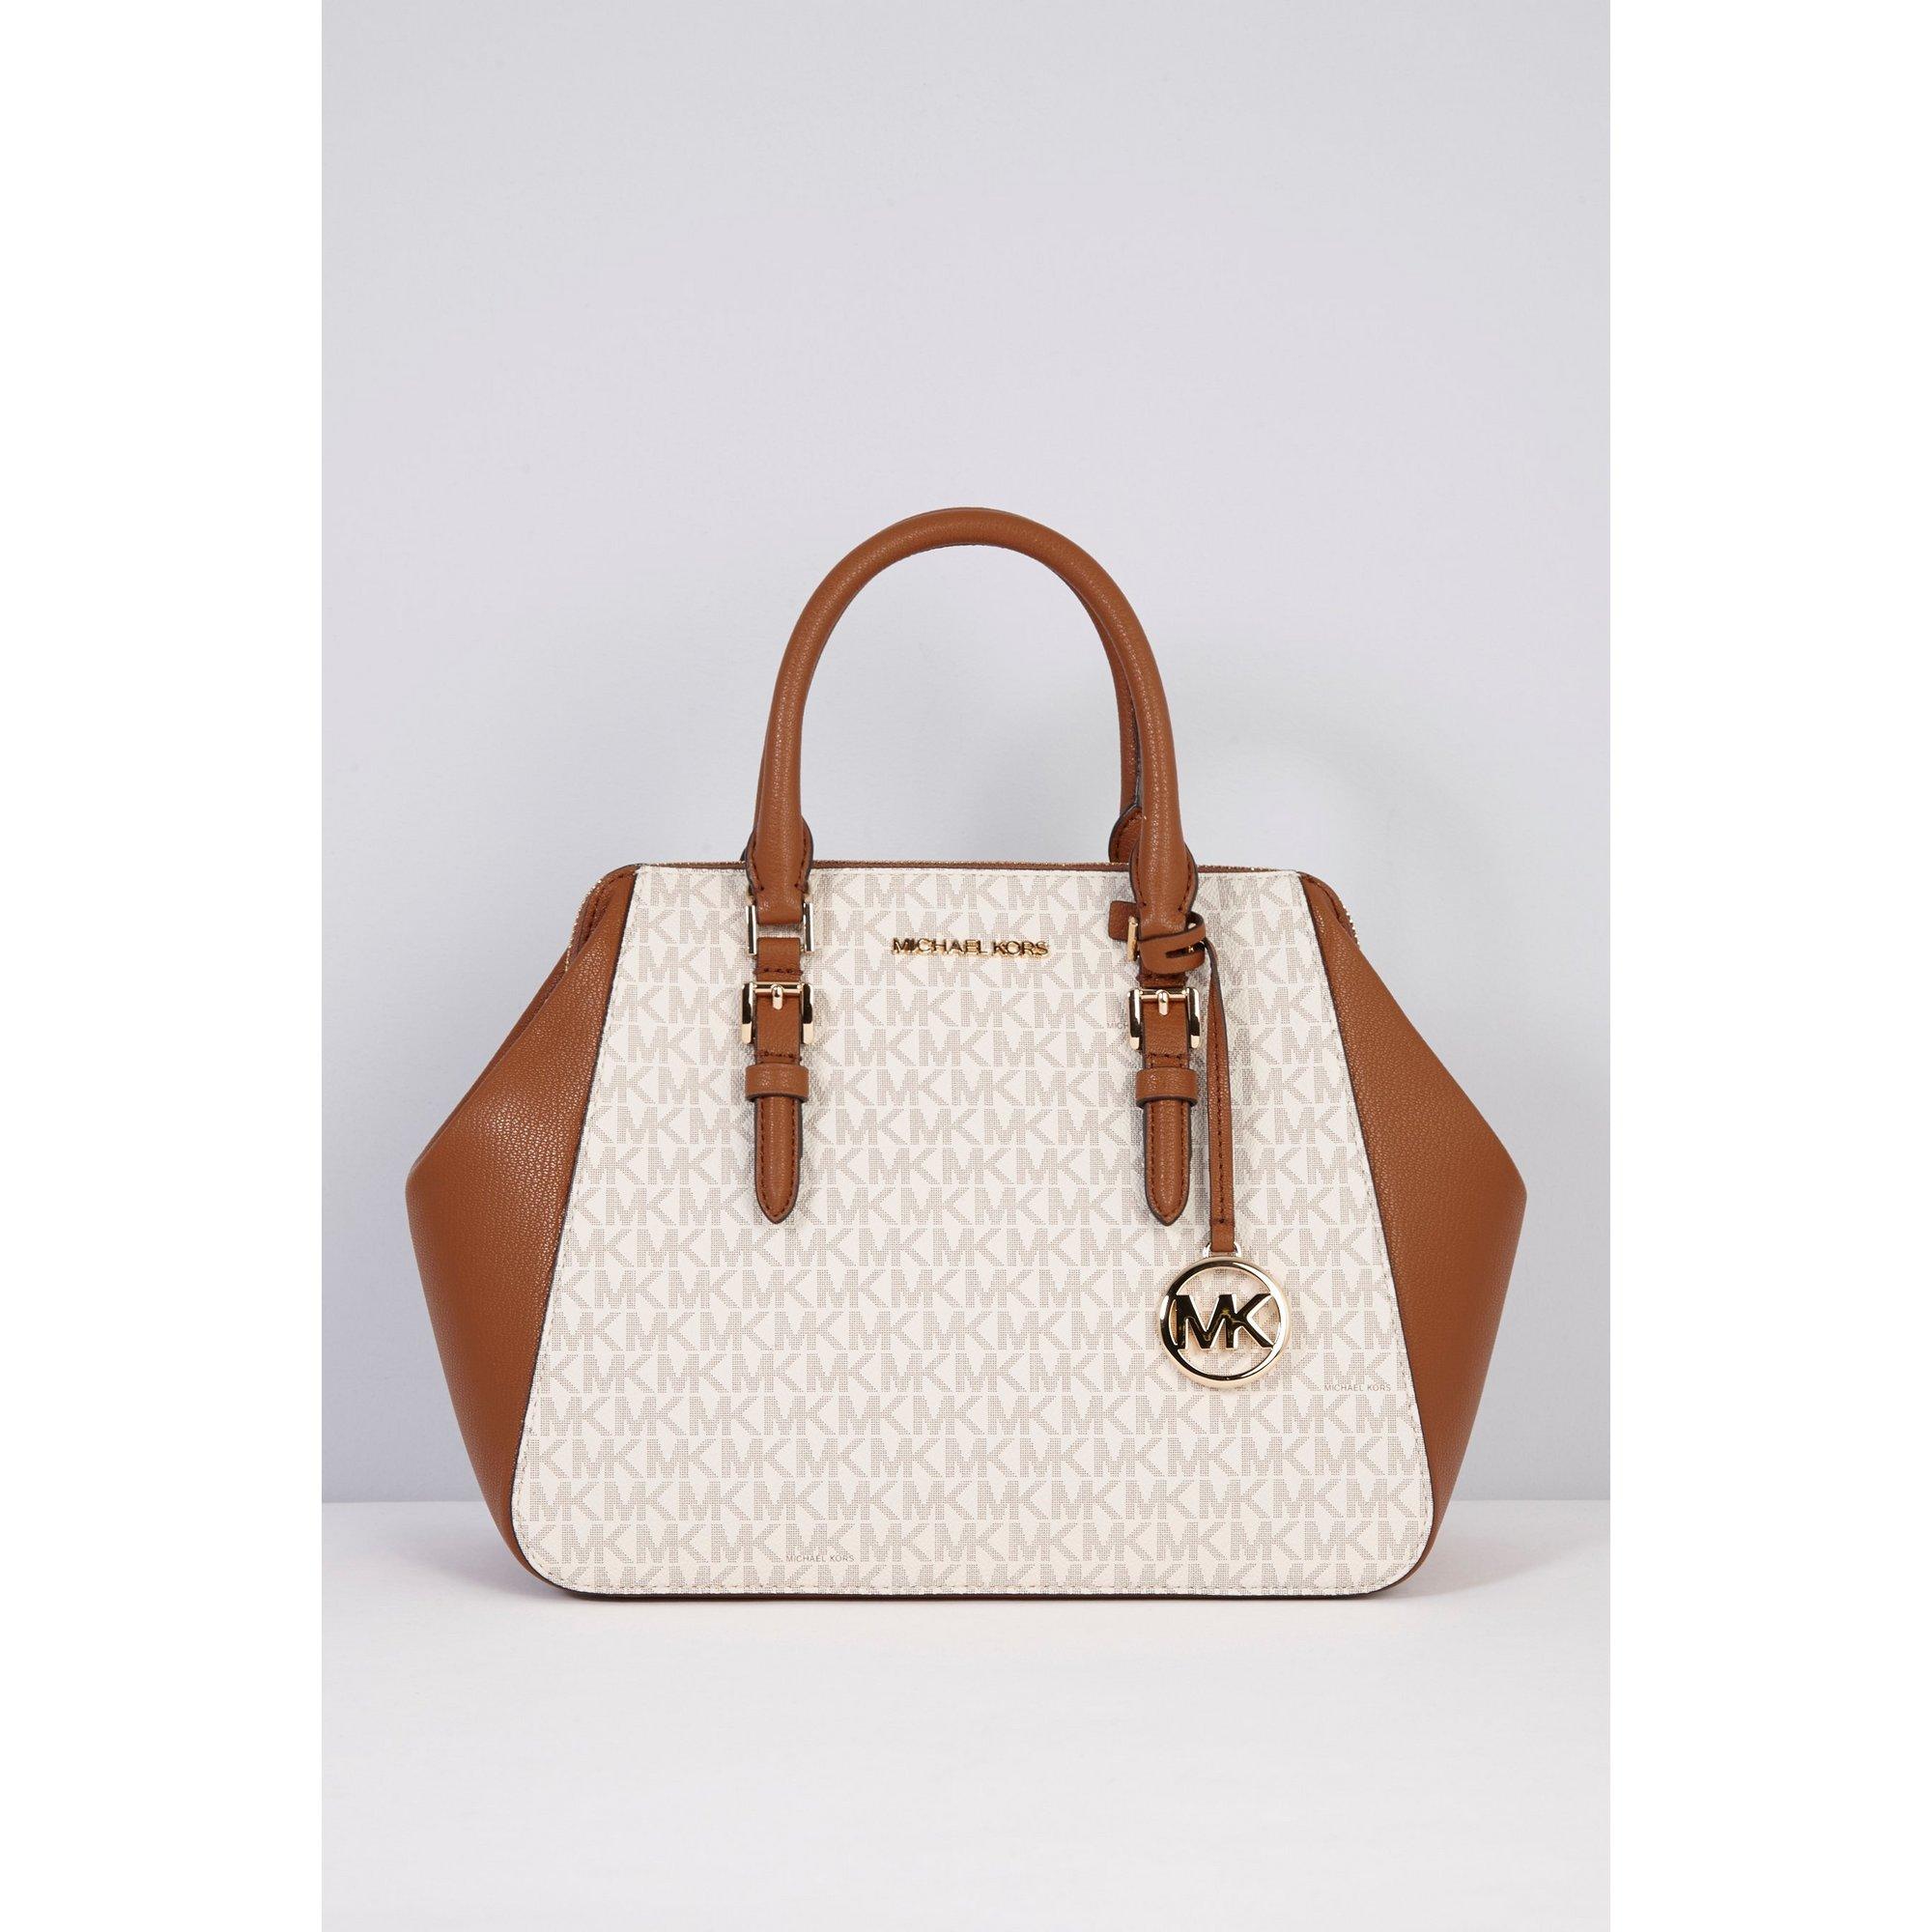 Image of Michael Kors Charlotte Satchel Vanilla Bag